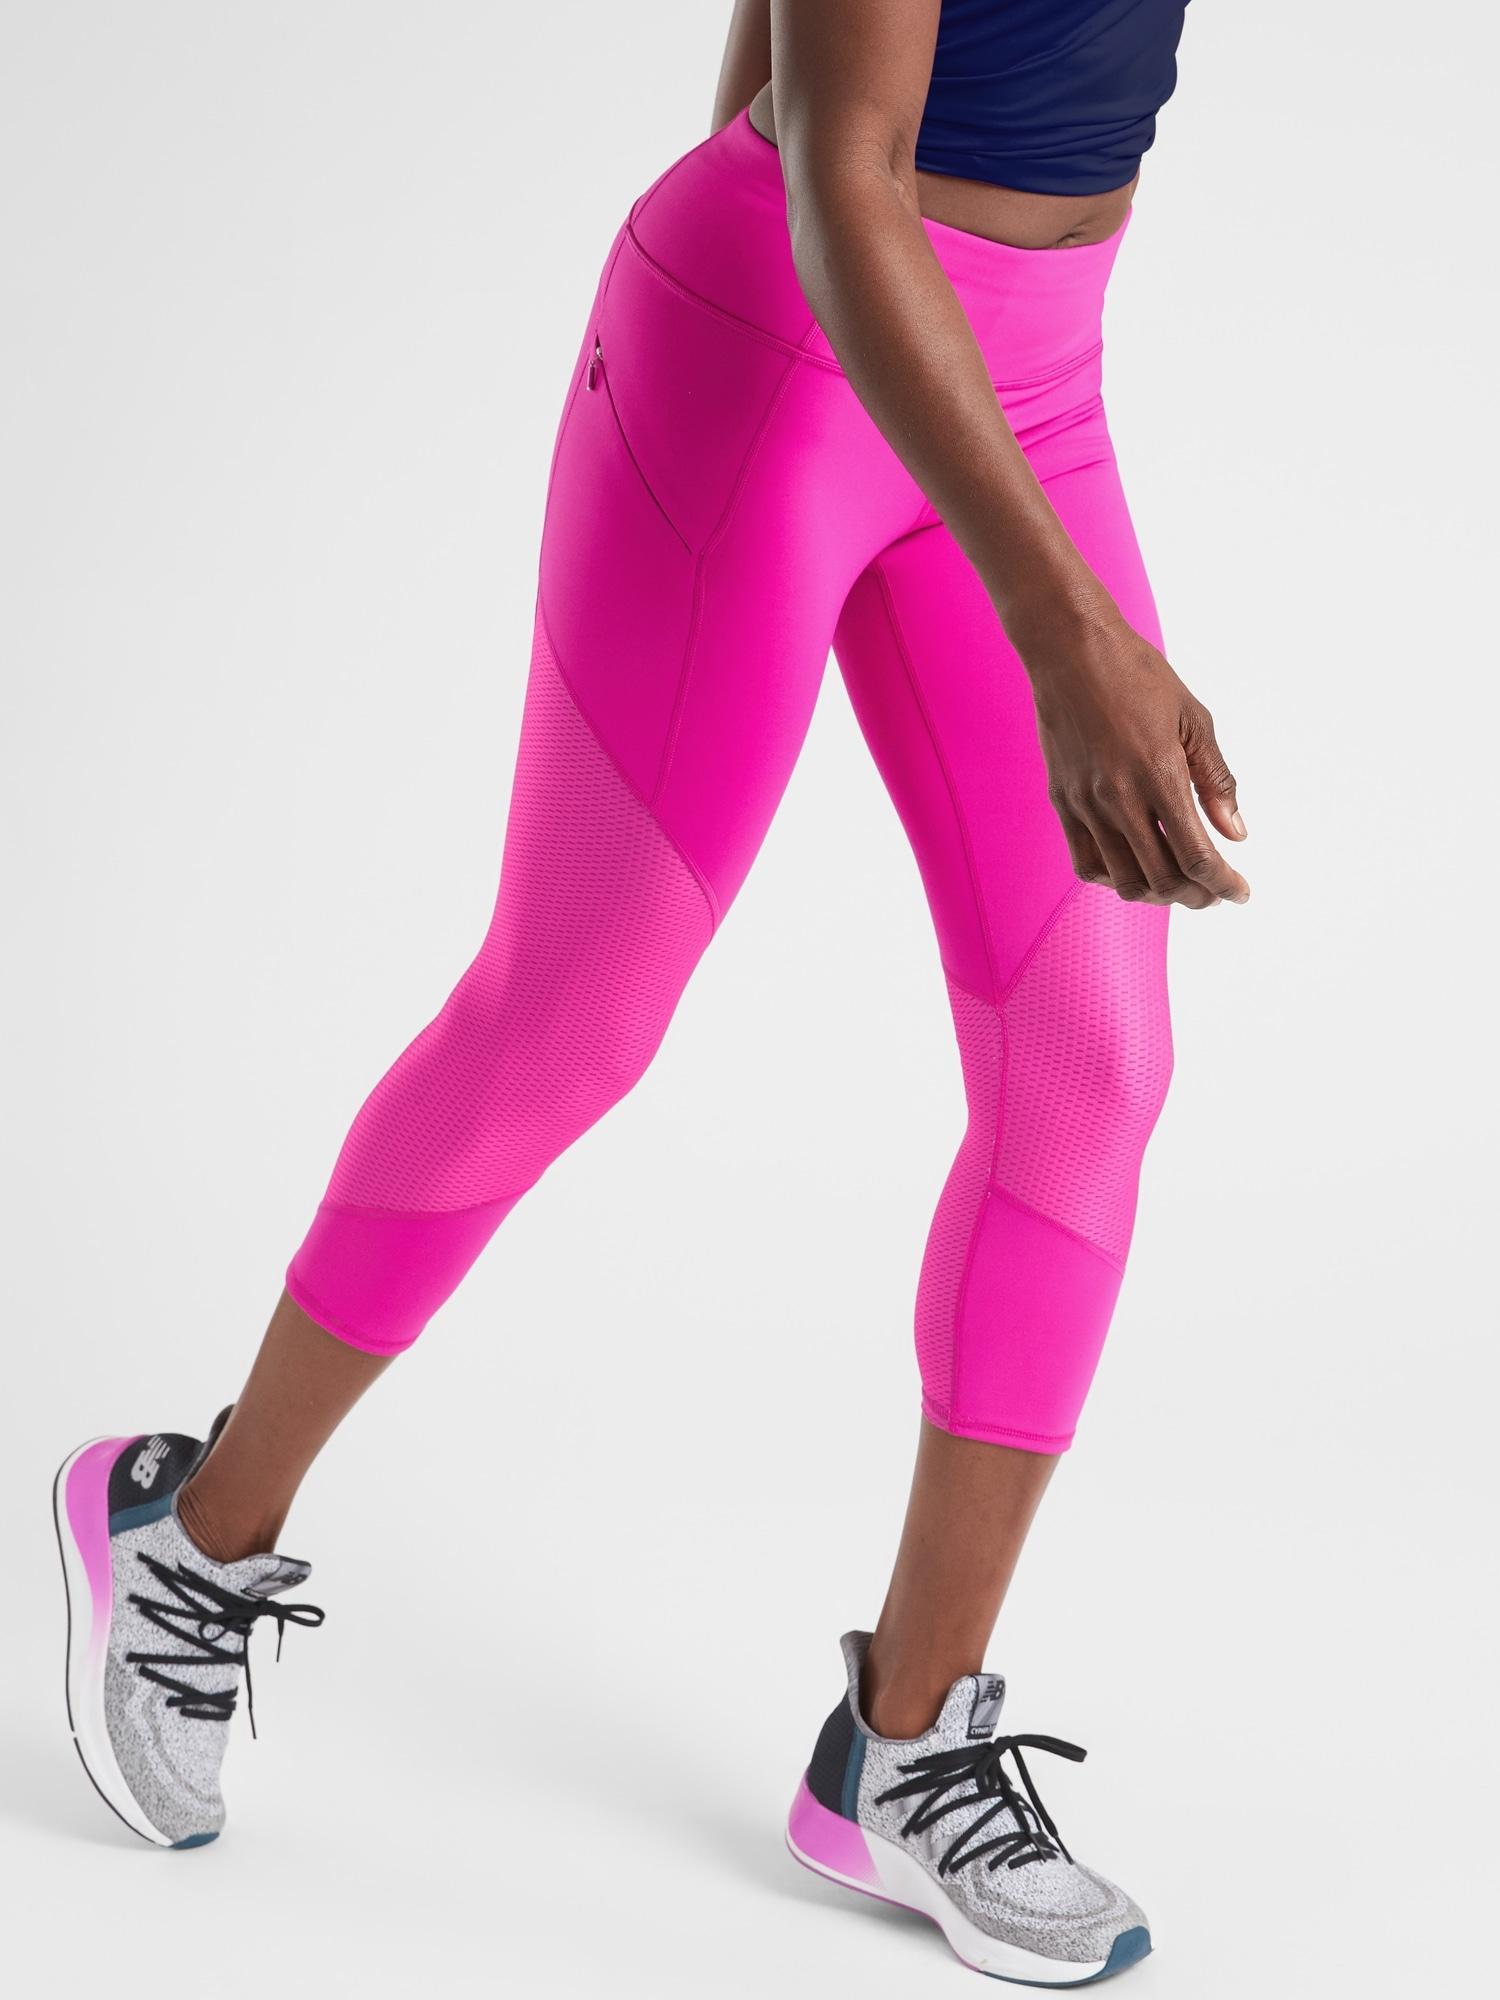 ec0fabe0122c40 Lyst - Athleta Mesh Contender Capri In Powerlift in Pink